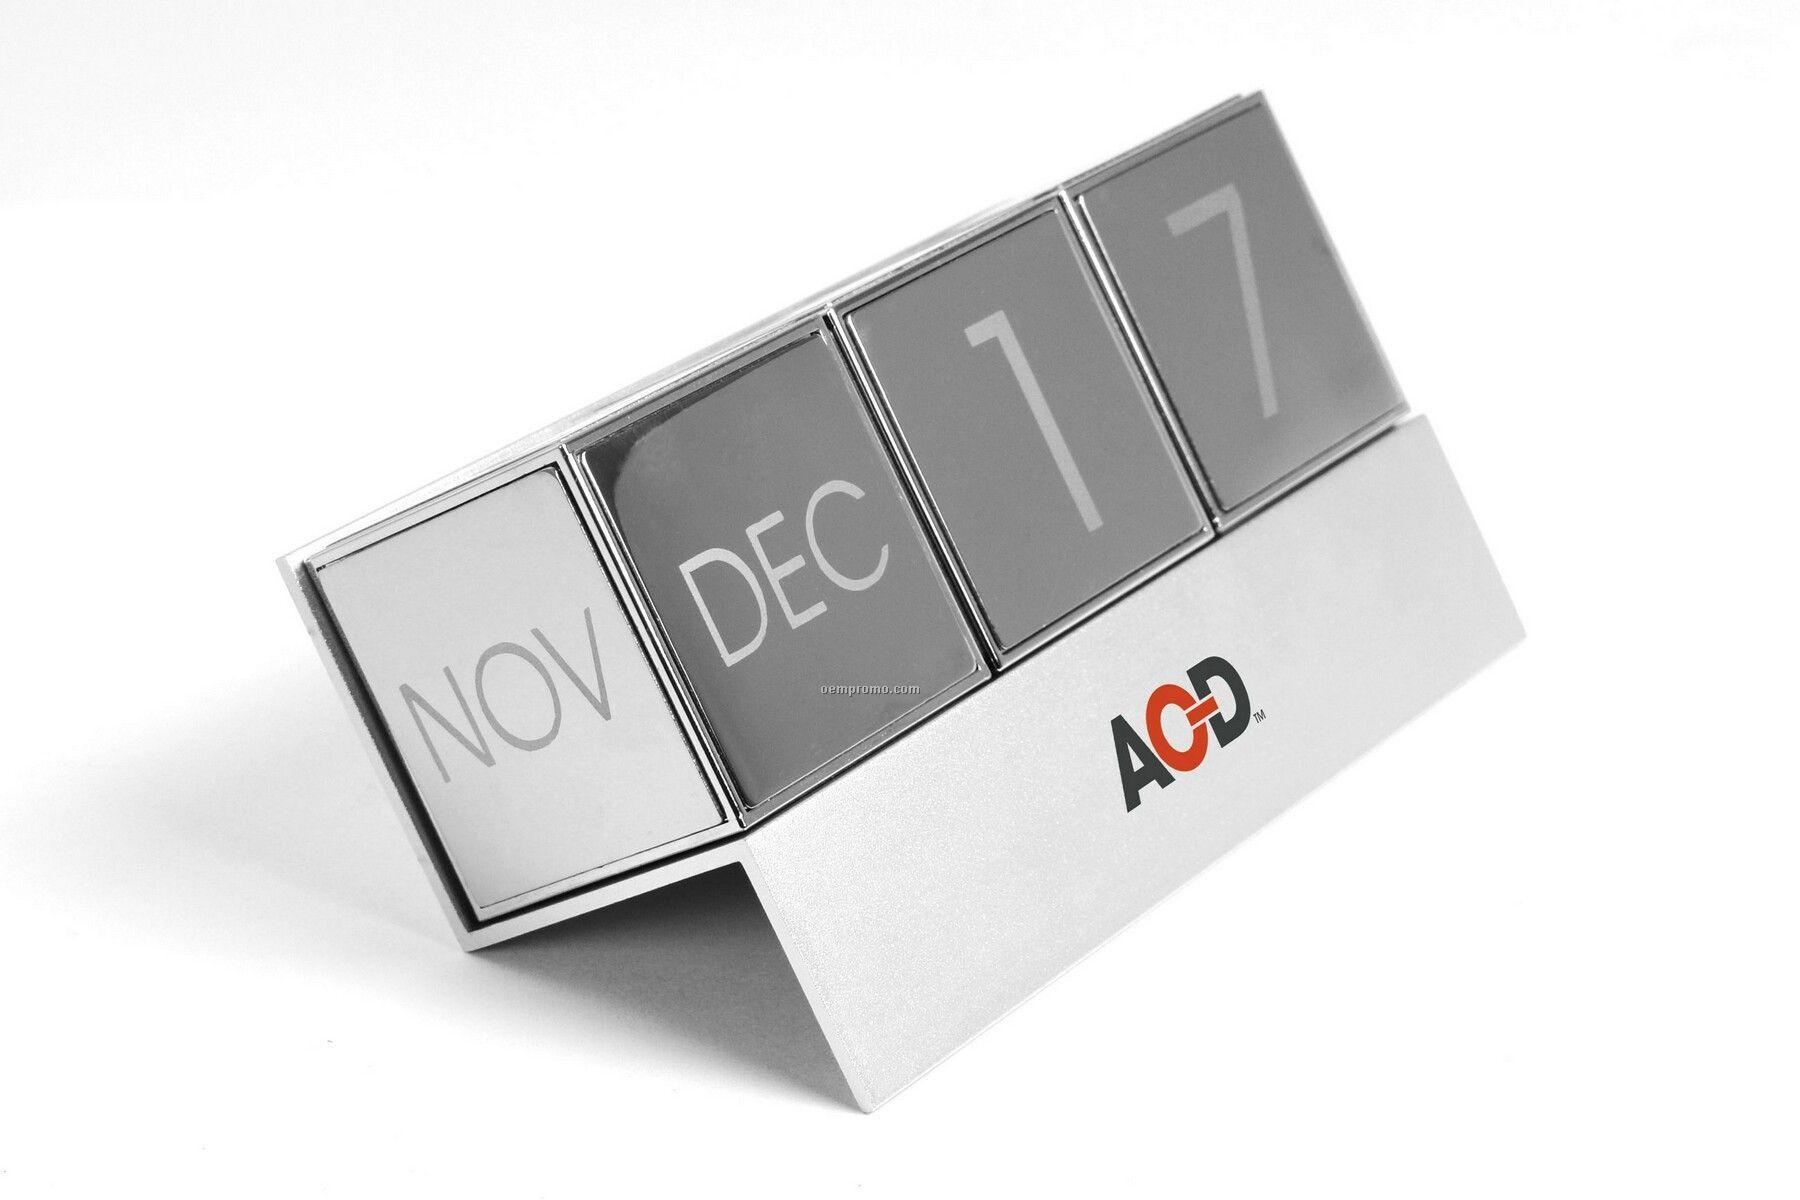 Perpetual Calendar Cube : Perpetual magnetic stainless steel cube calendar china